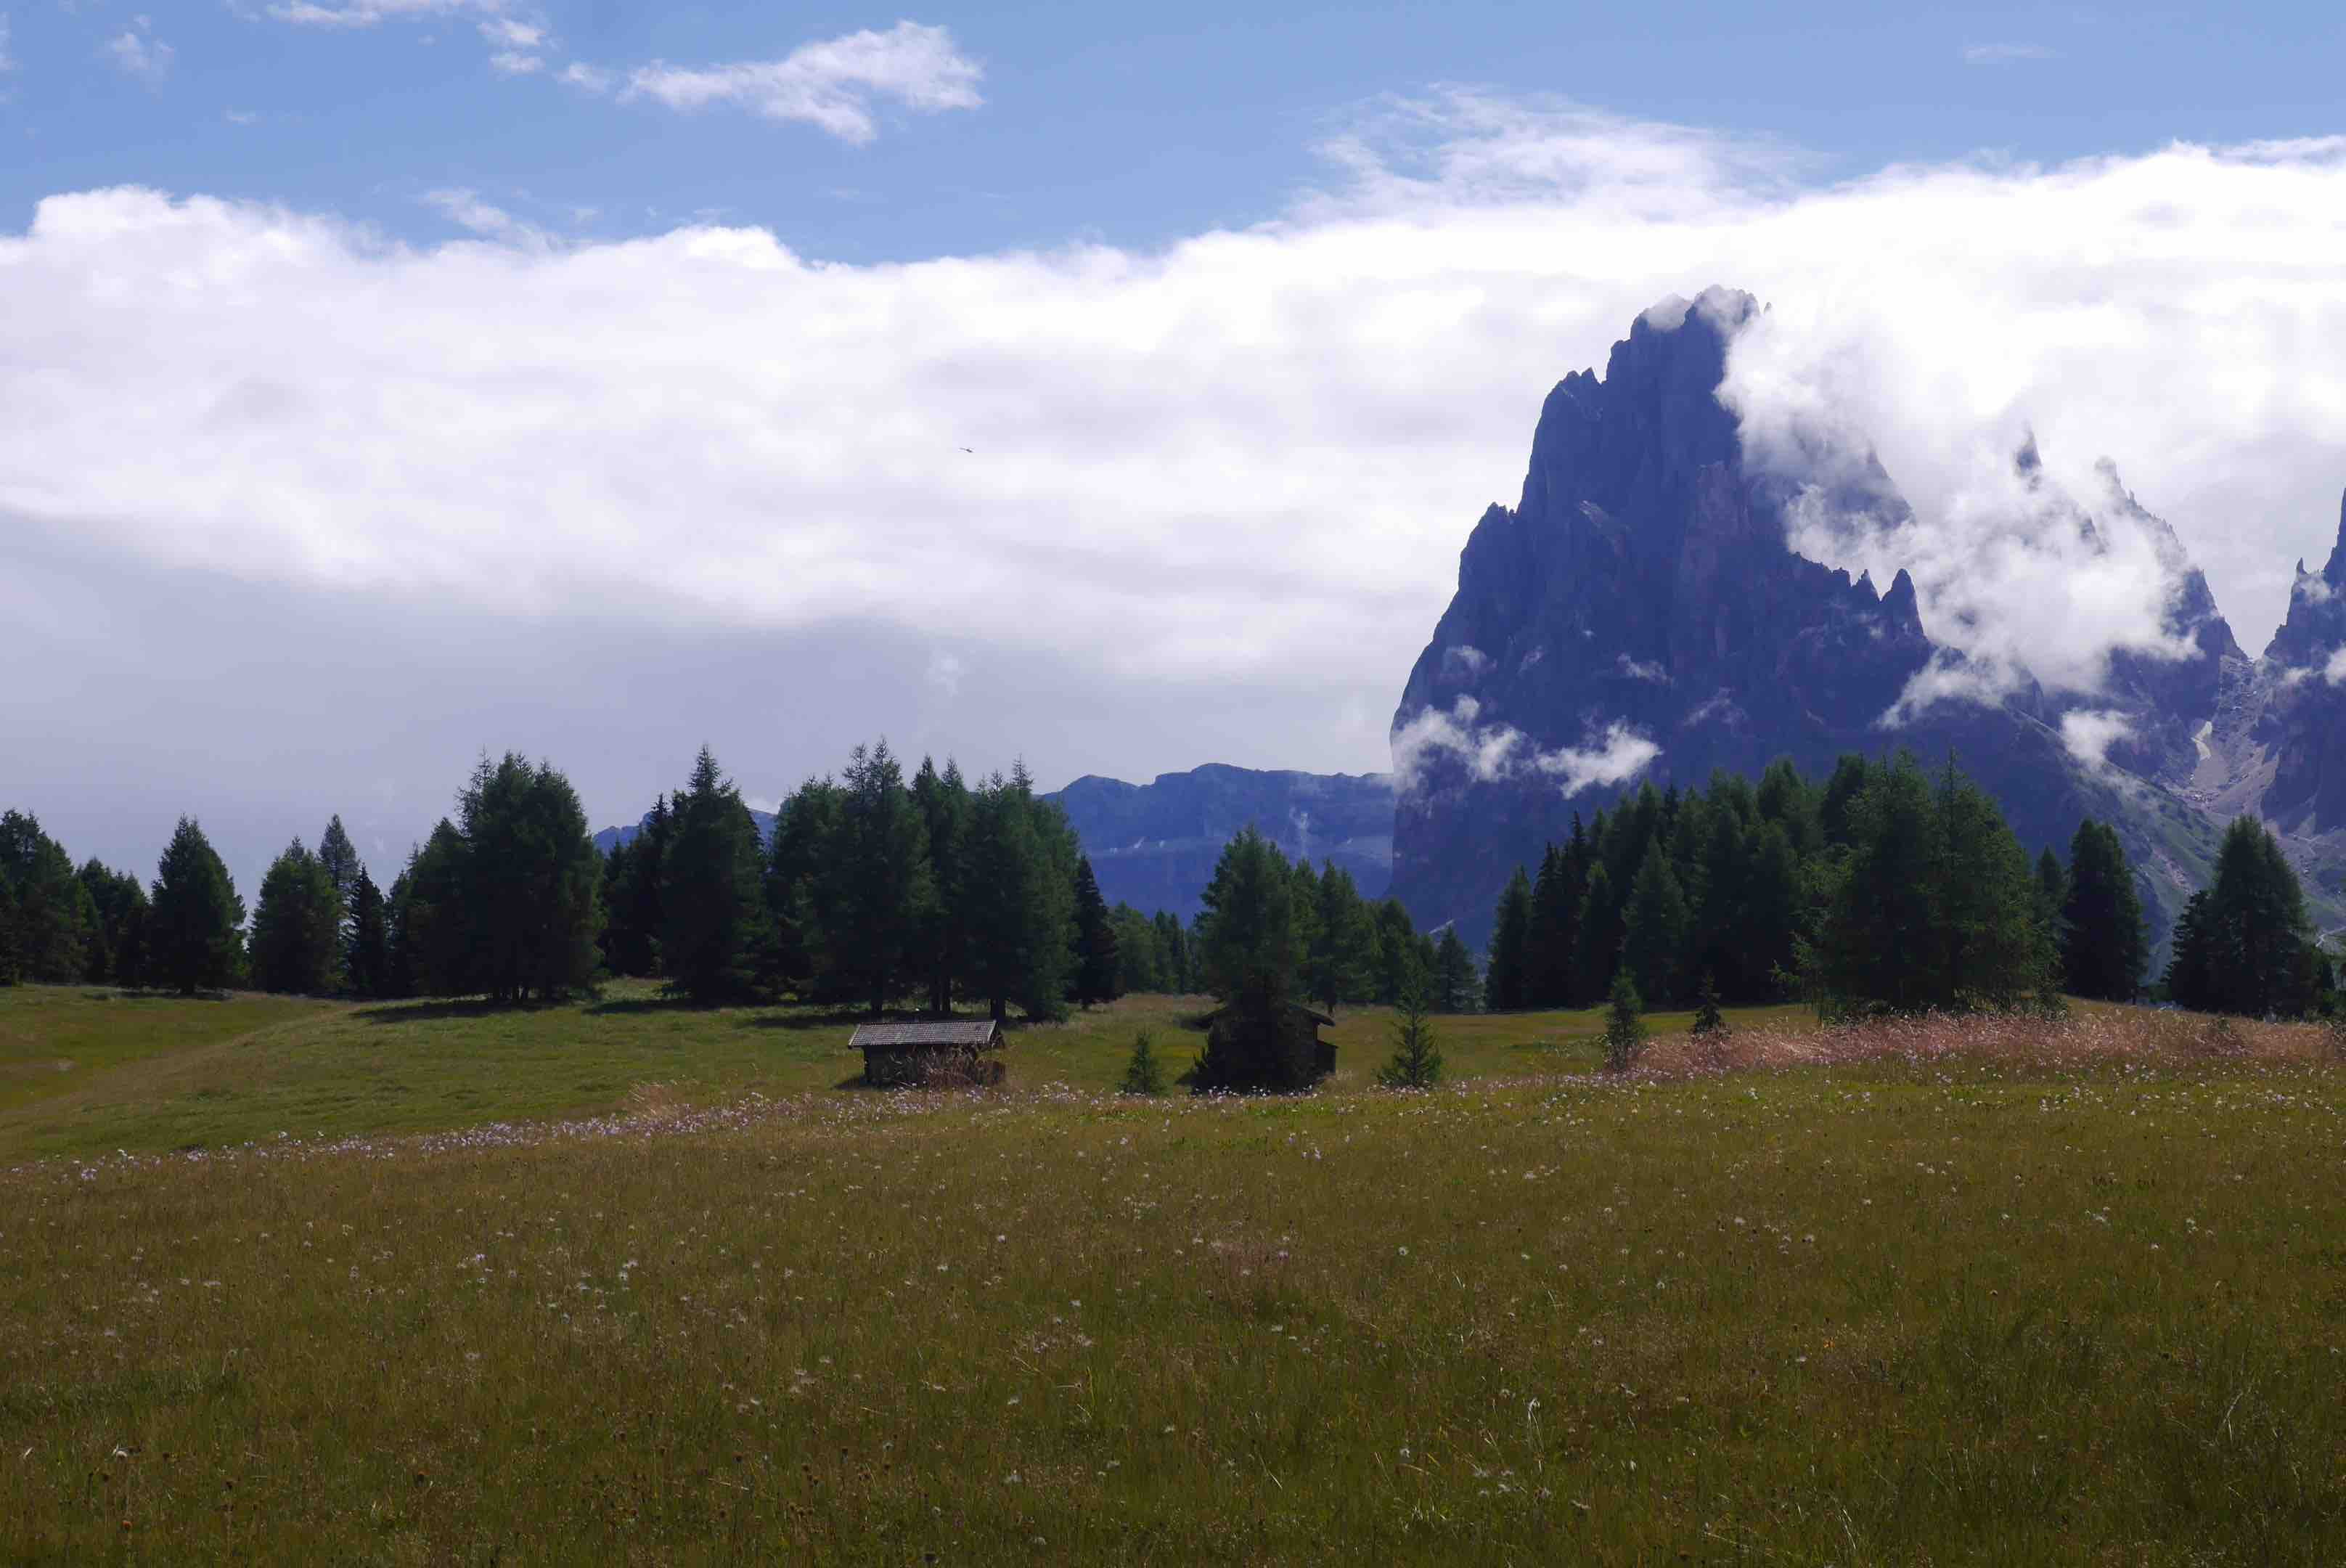 montagne-italie-ali-di-firenze-2